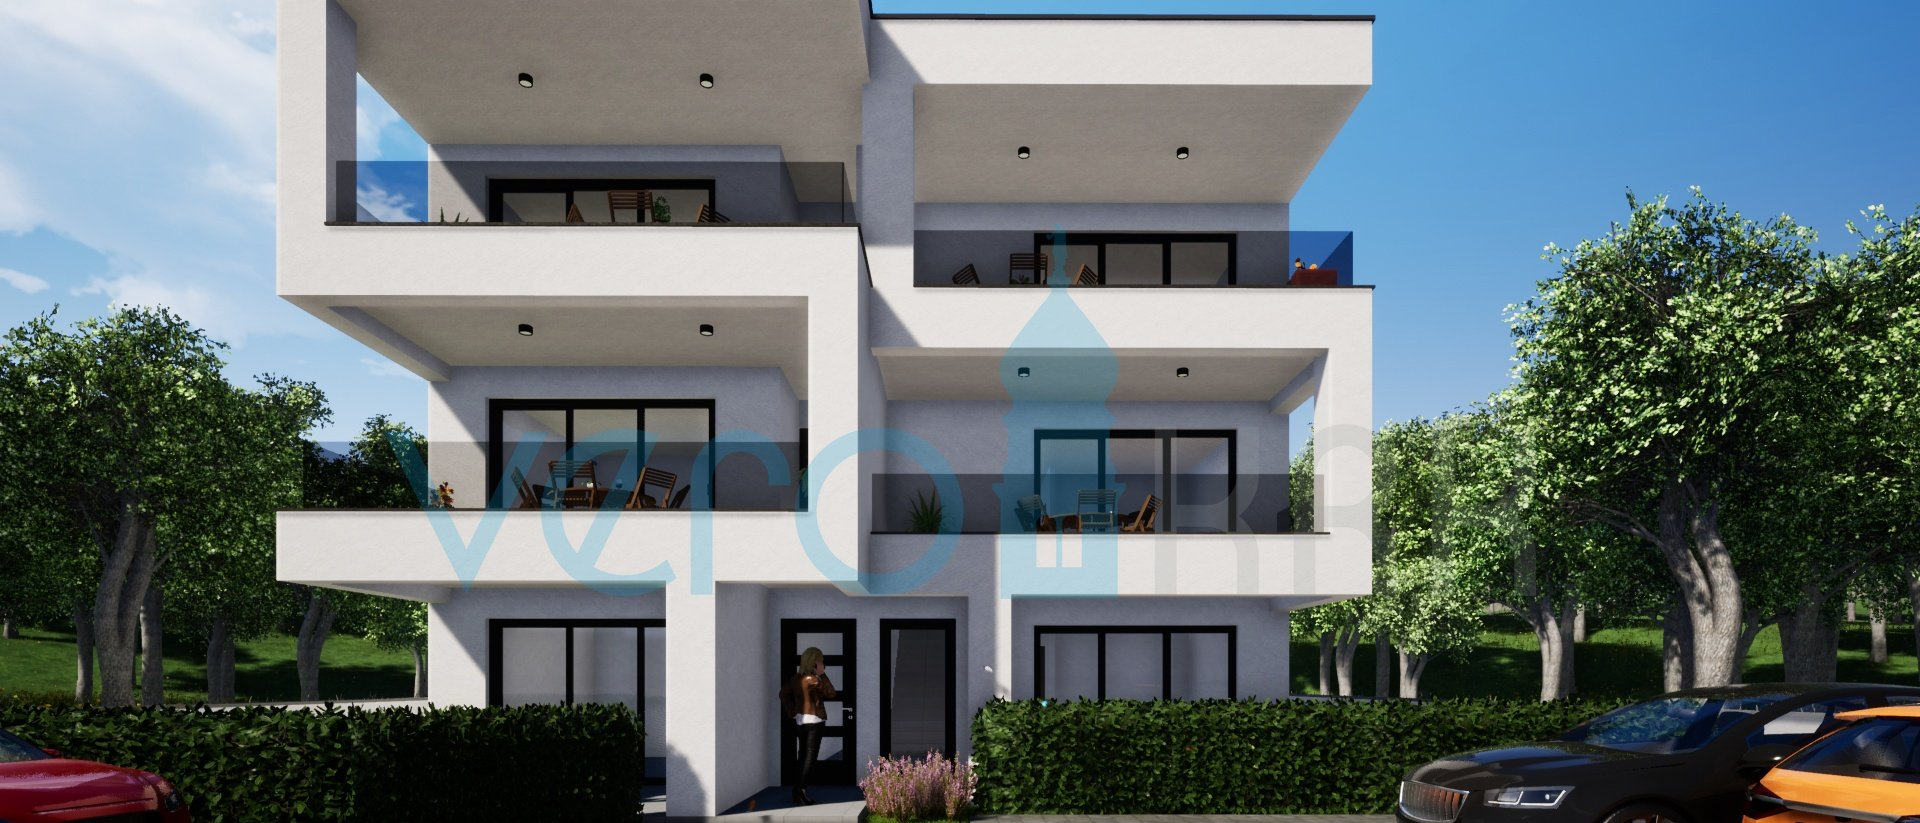 Appartamento, 110 m2, Vendita, Njivice